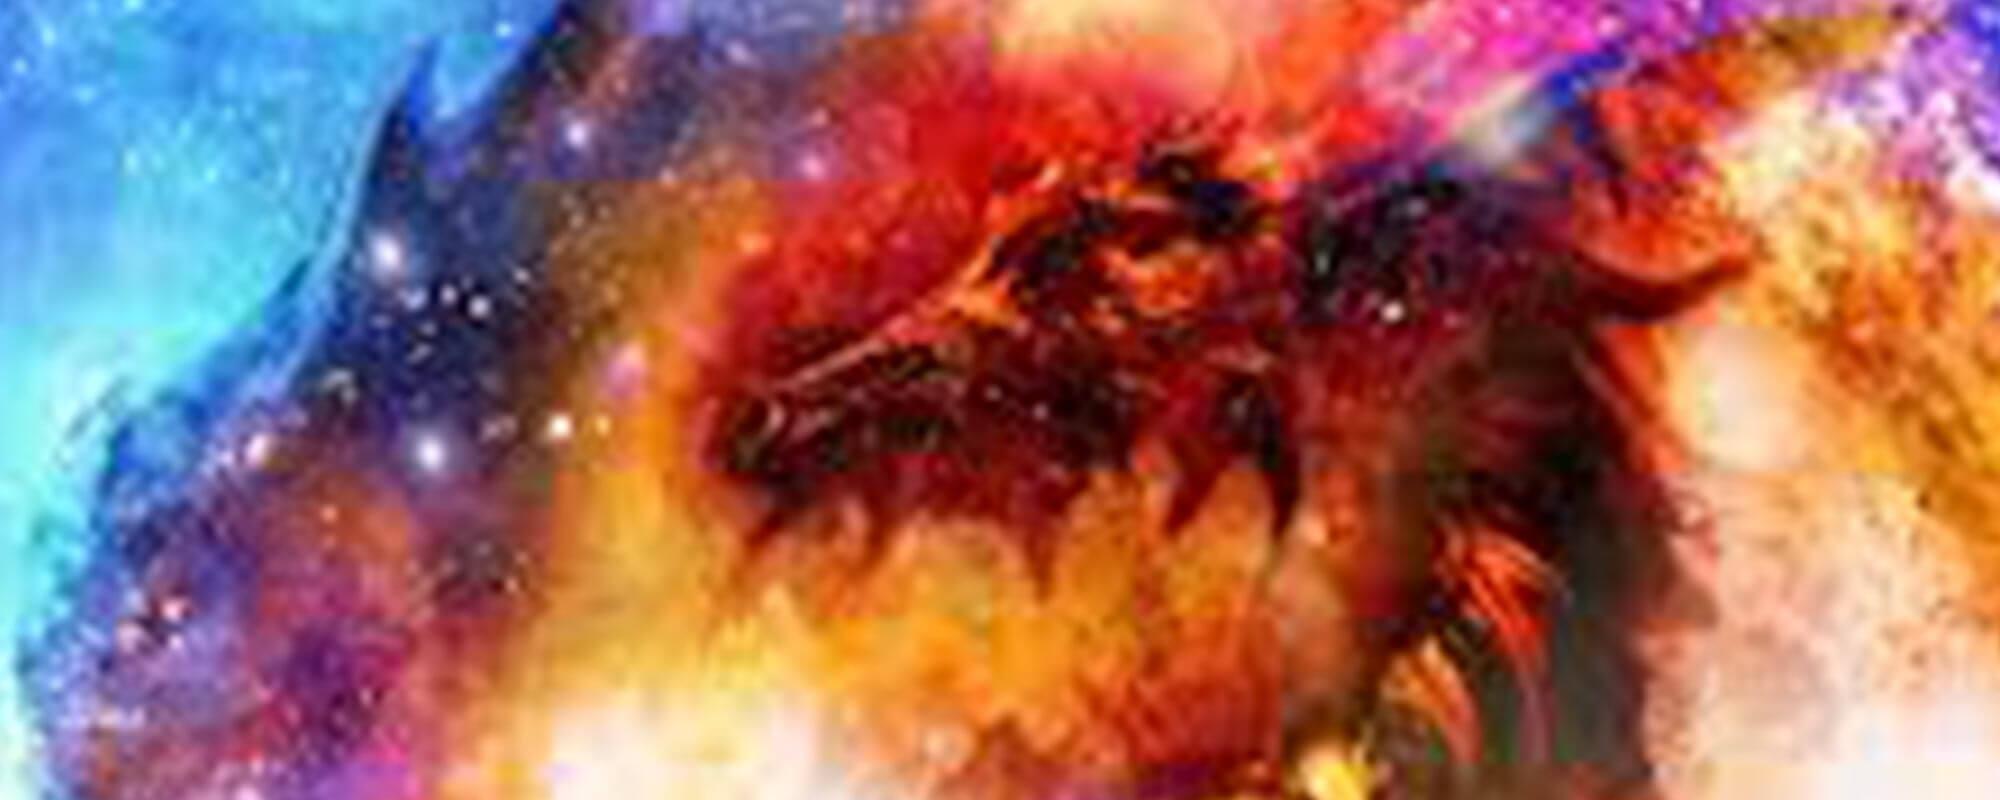 Dragon Resonance ~ Primeval Powers of Creation